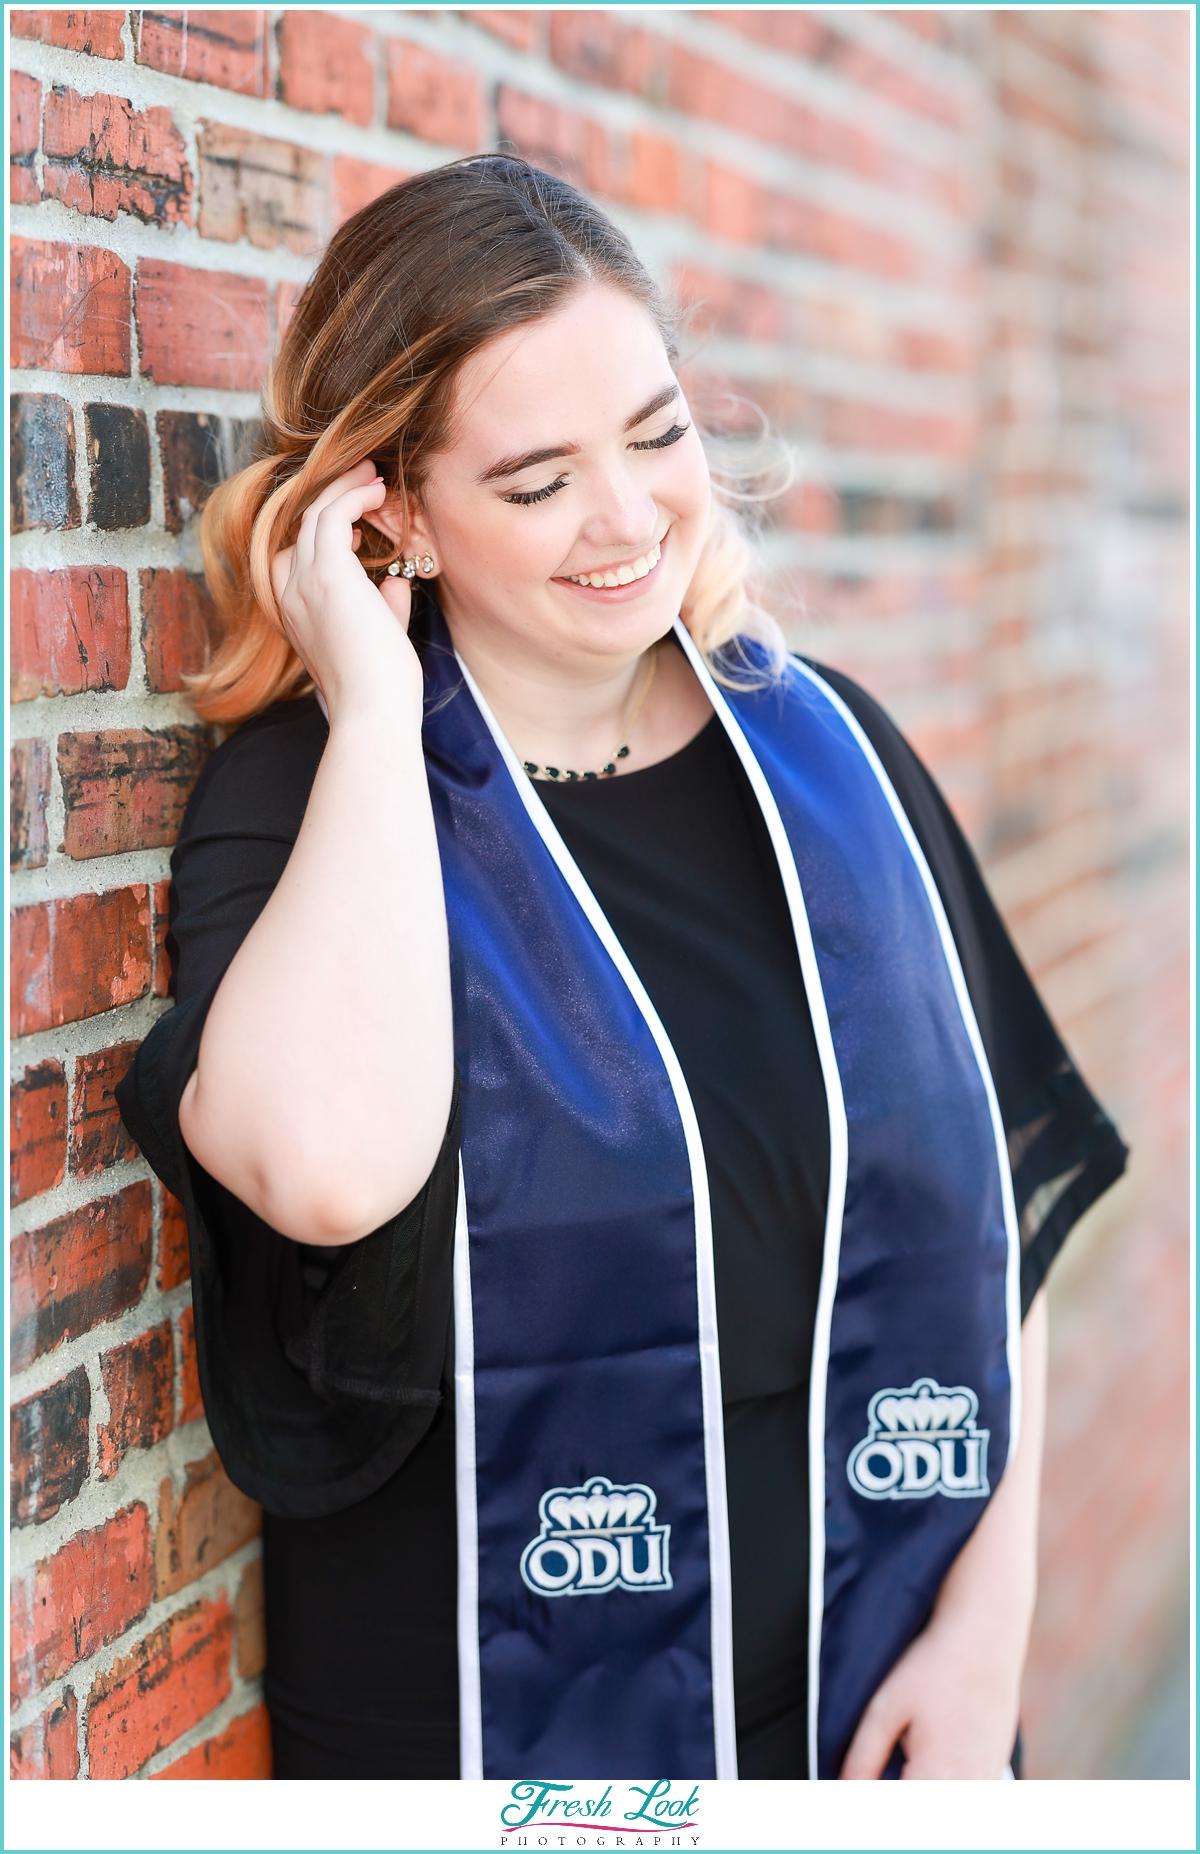 Old Dominion University Graduation Photographer